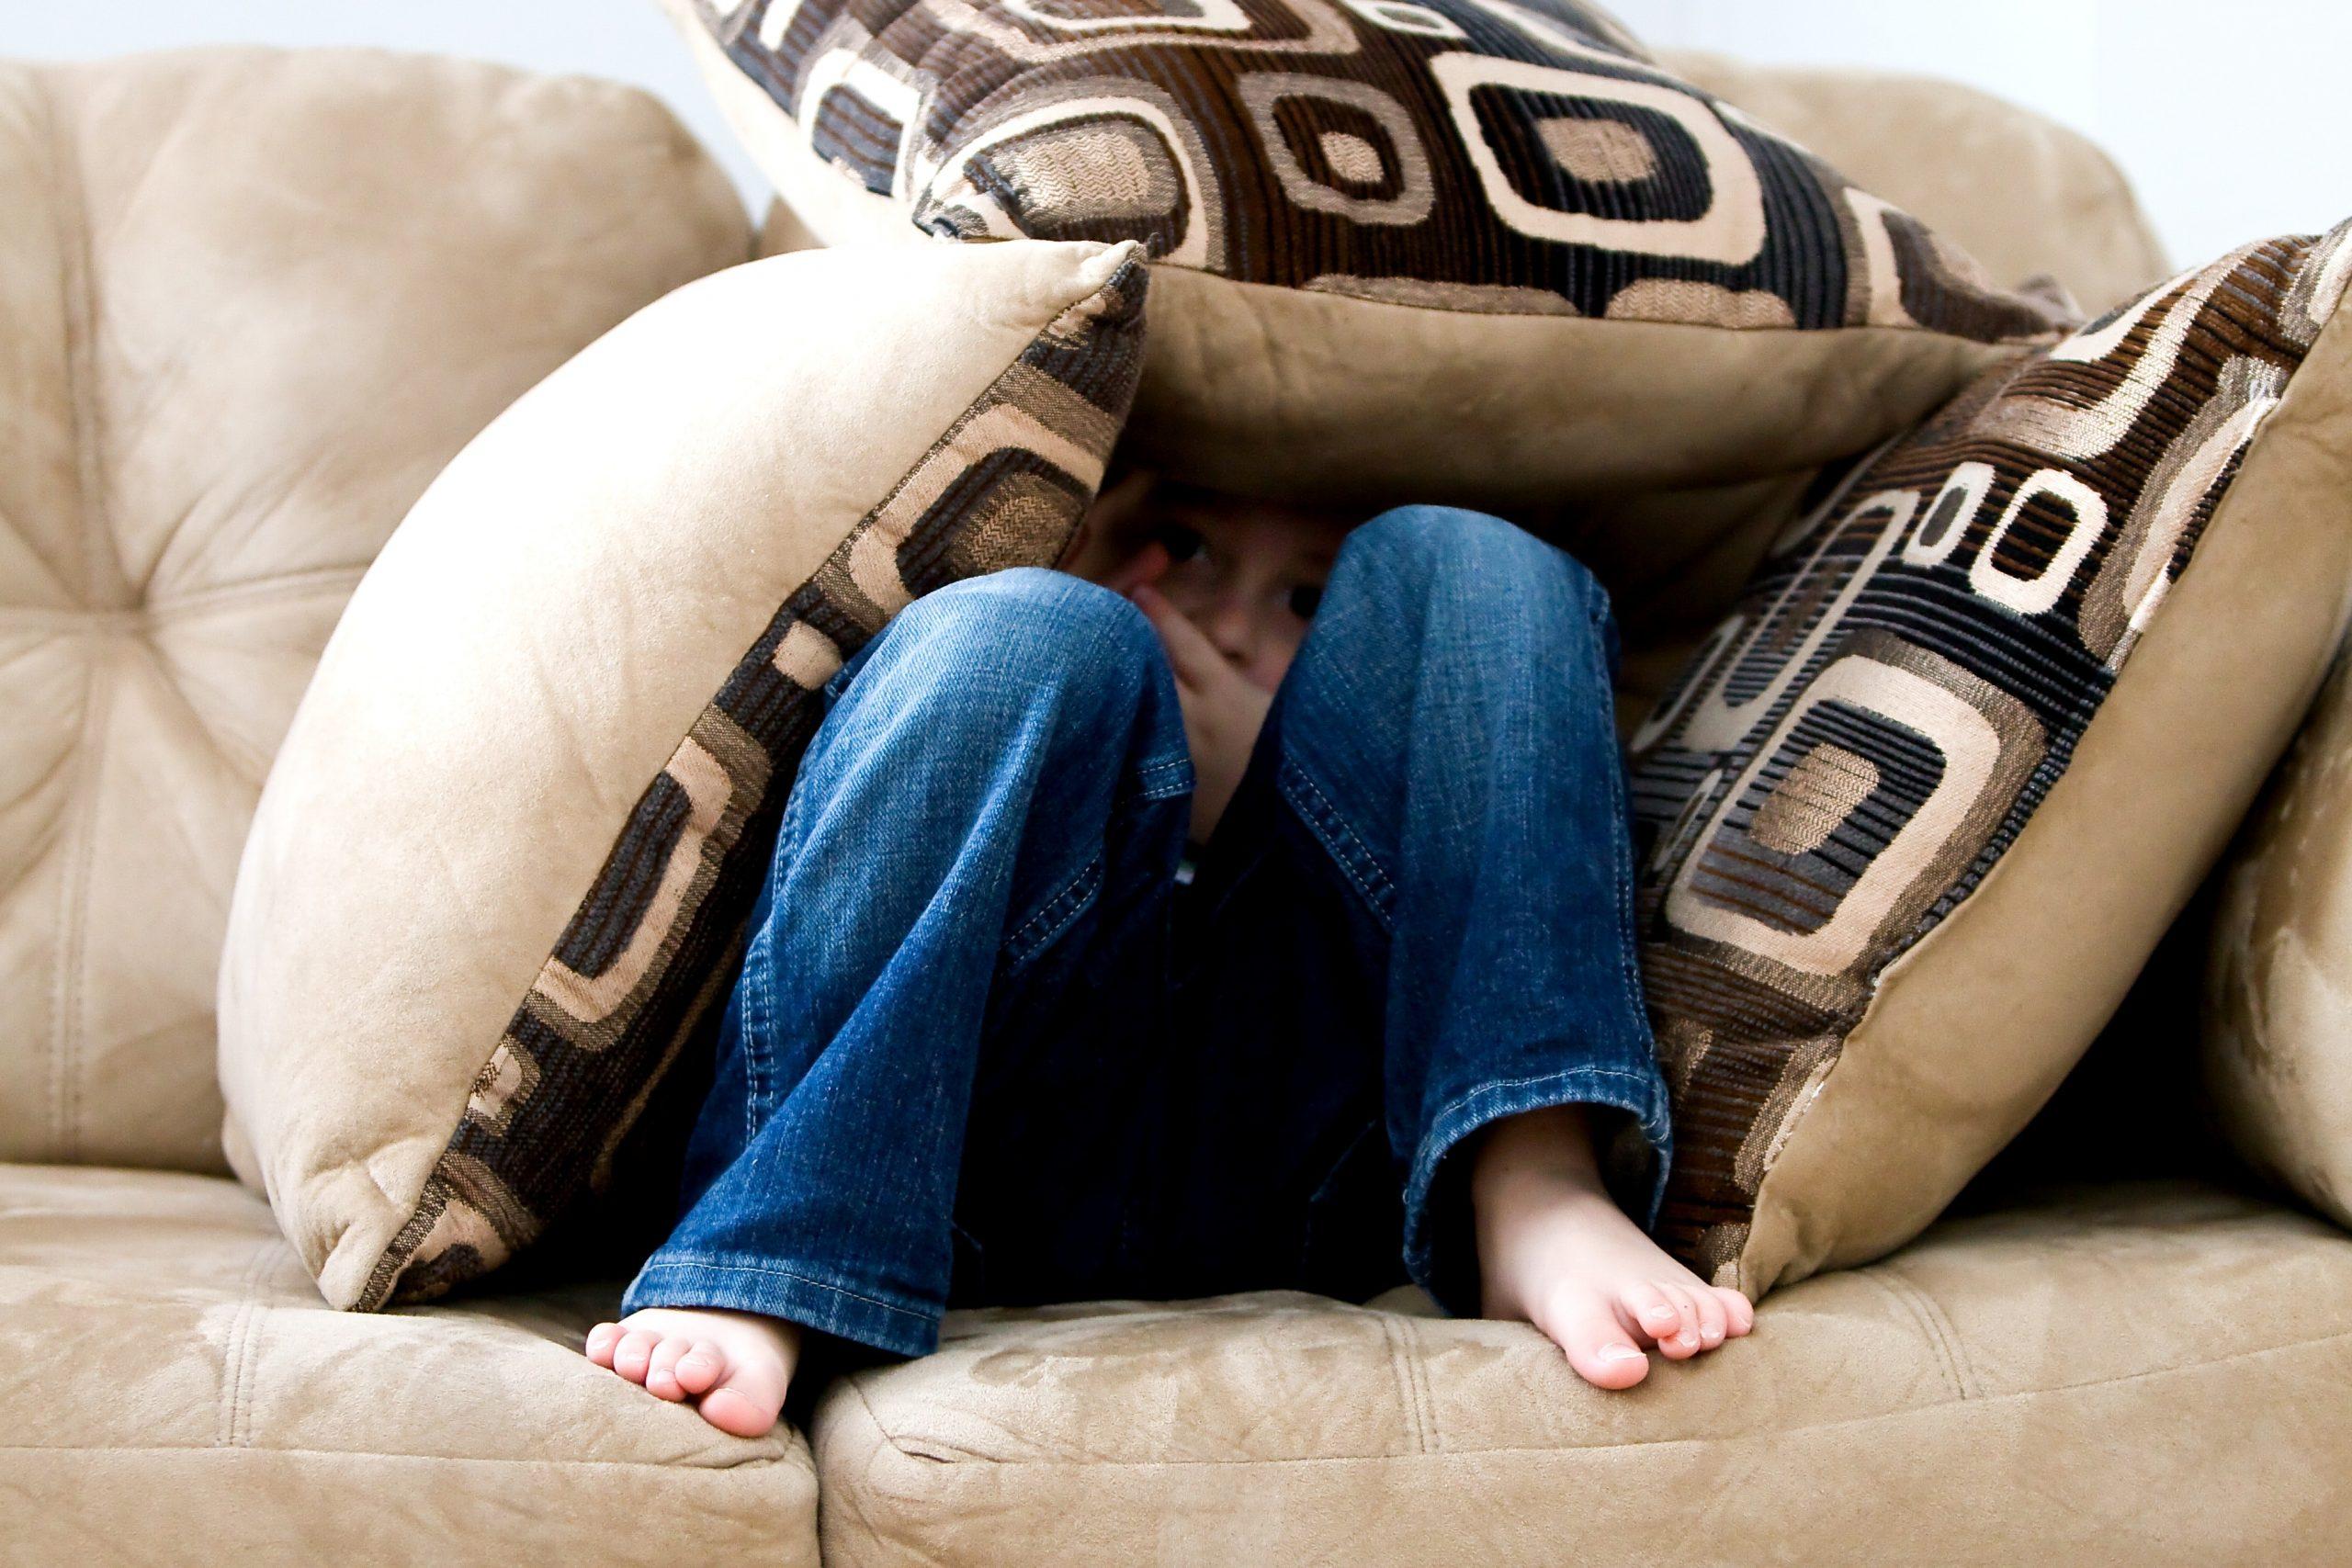 The Fear Bunker: Where we go when we feel treatened